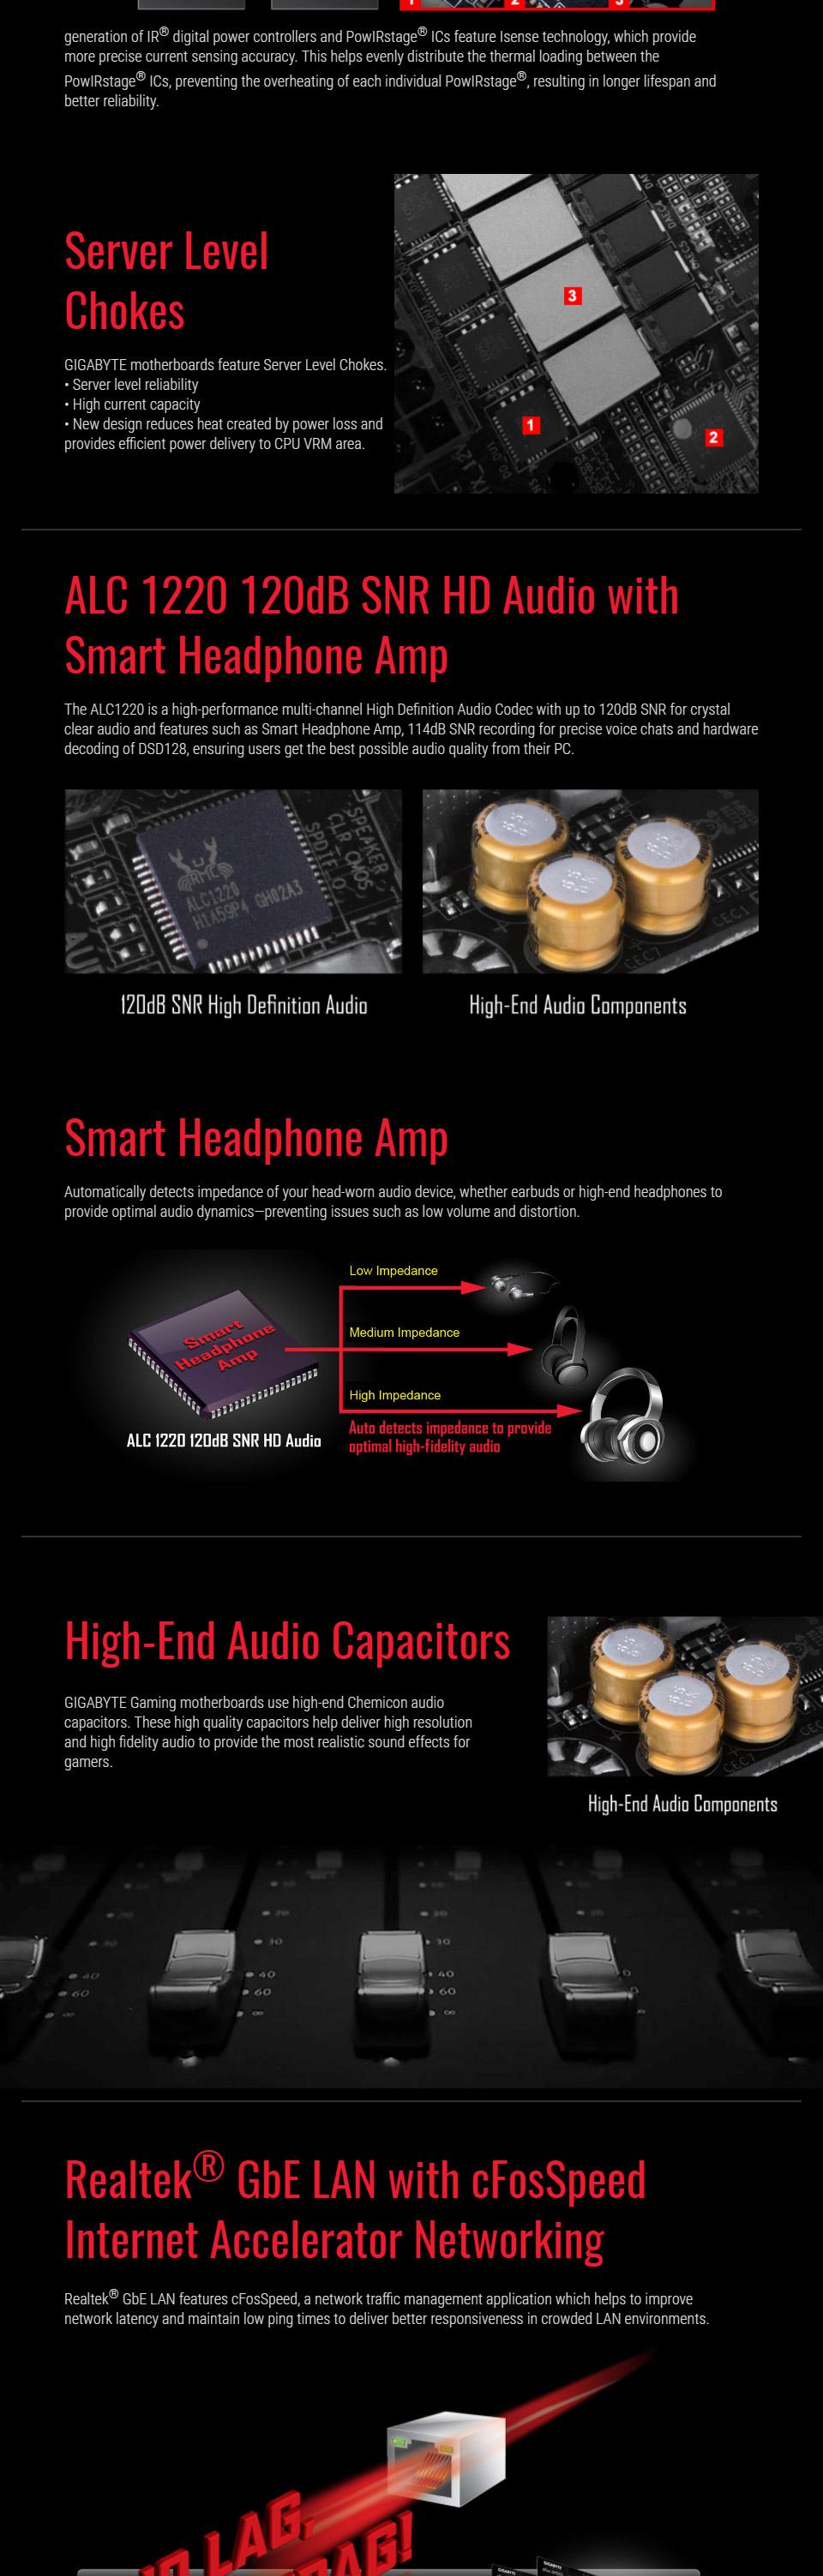 Buy Gigabyte AB350N-GAMING-WIFI ITX Motherboard [GA-AB350N-GAMING-WIFI]   PC Case Gear Australia